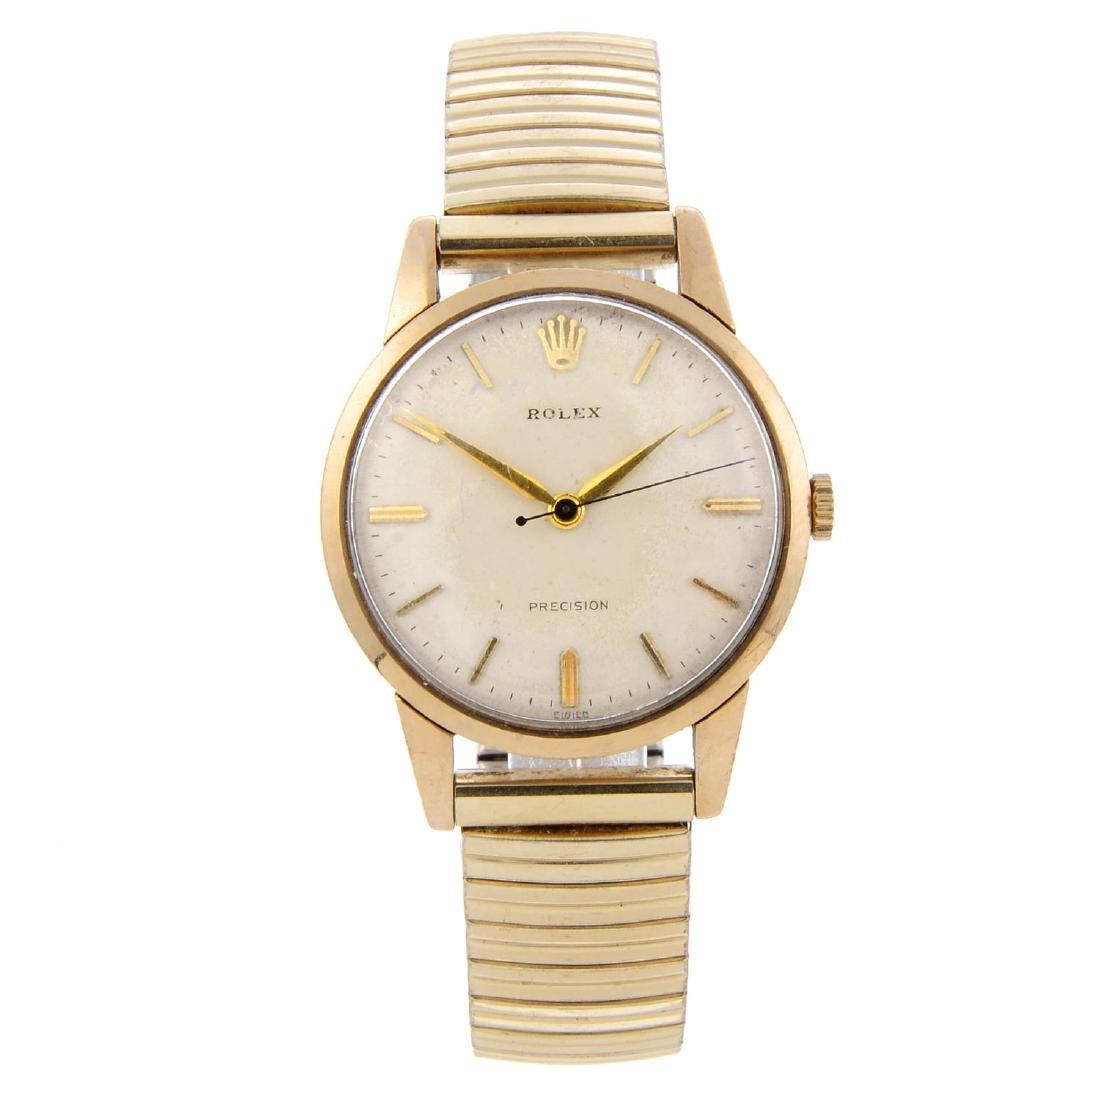 ROLEX - a gentleman's Precision bracelet watch. 9ct